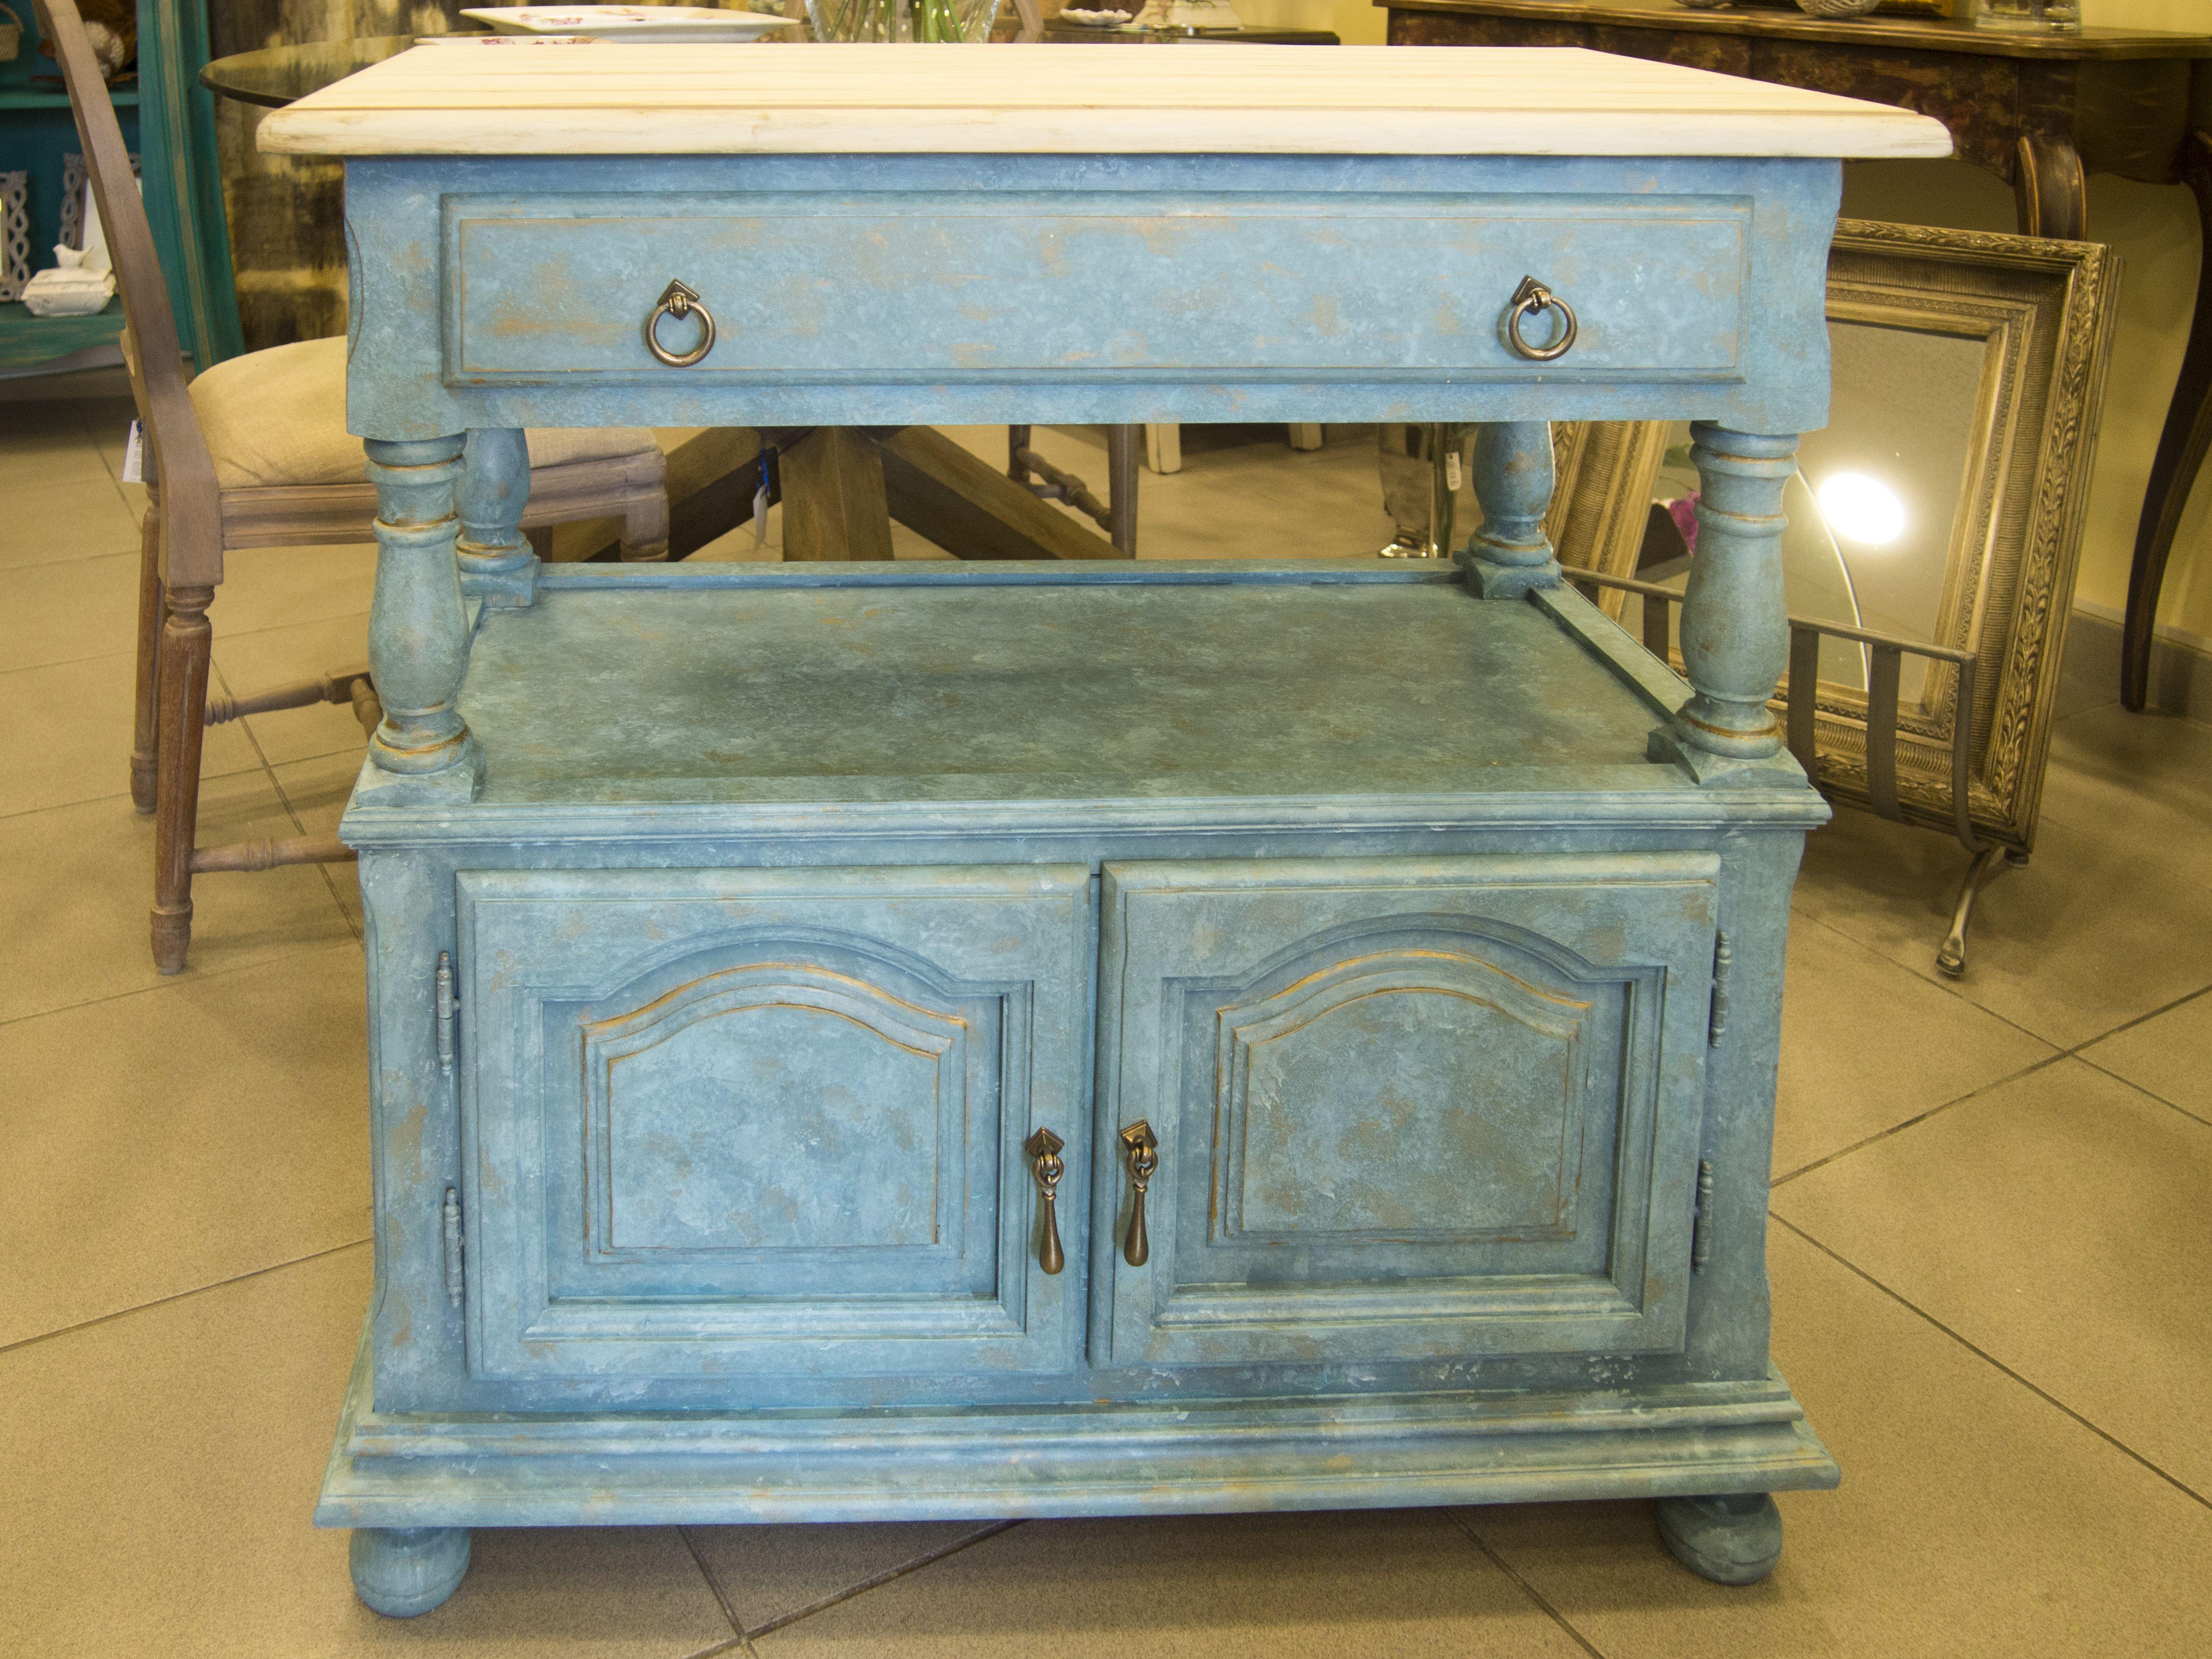 mueble estilo provenzal pintado en tonos azules a la tecnica de la esponja tapa